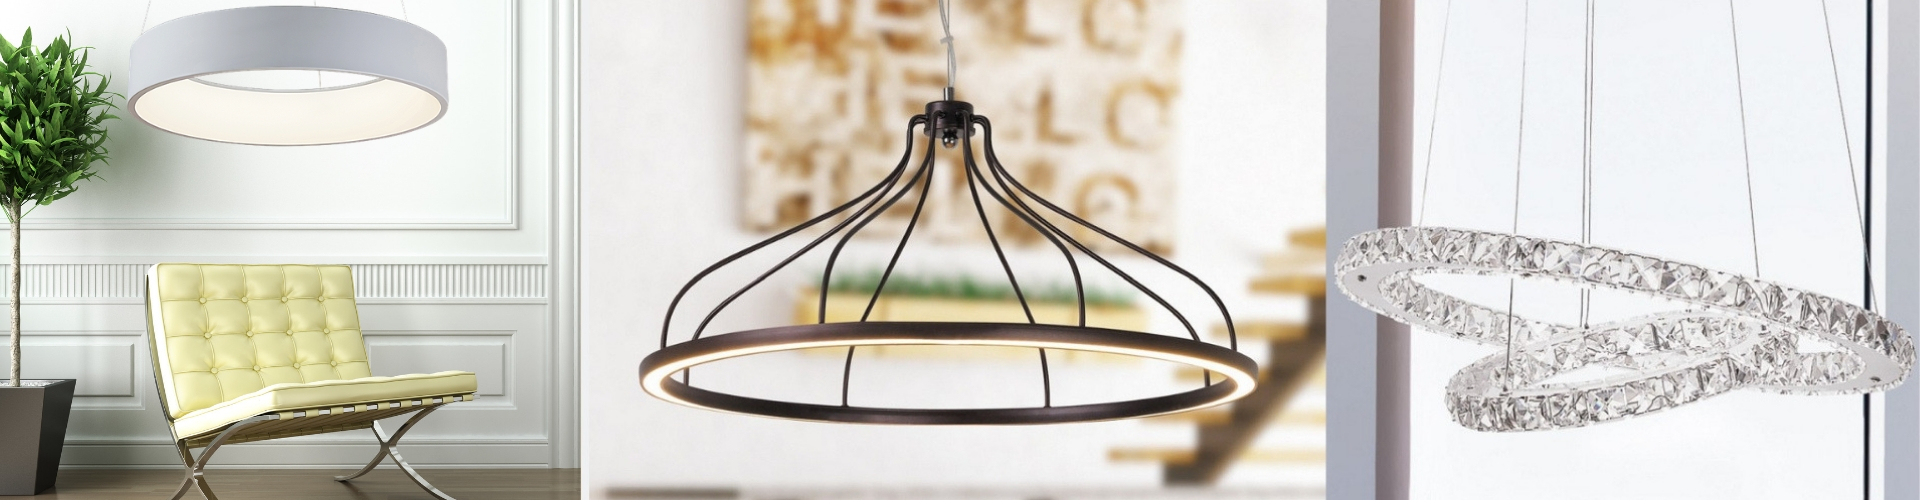 LED svetelné zdroje